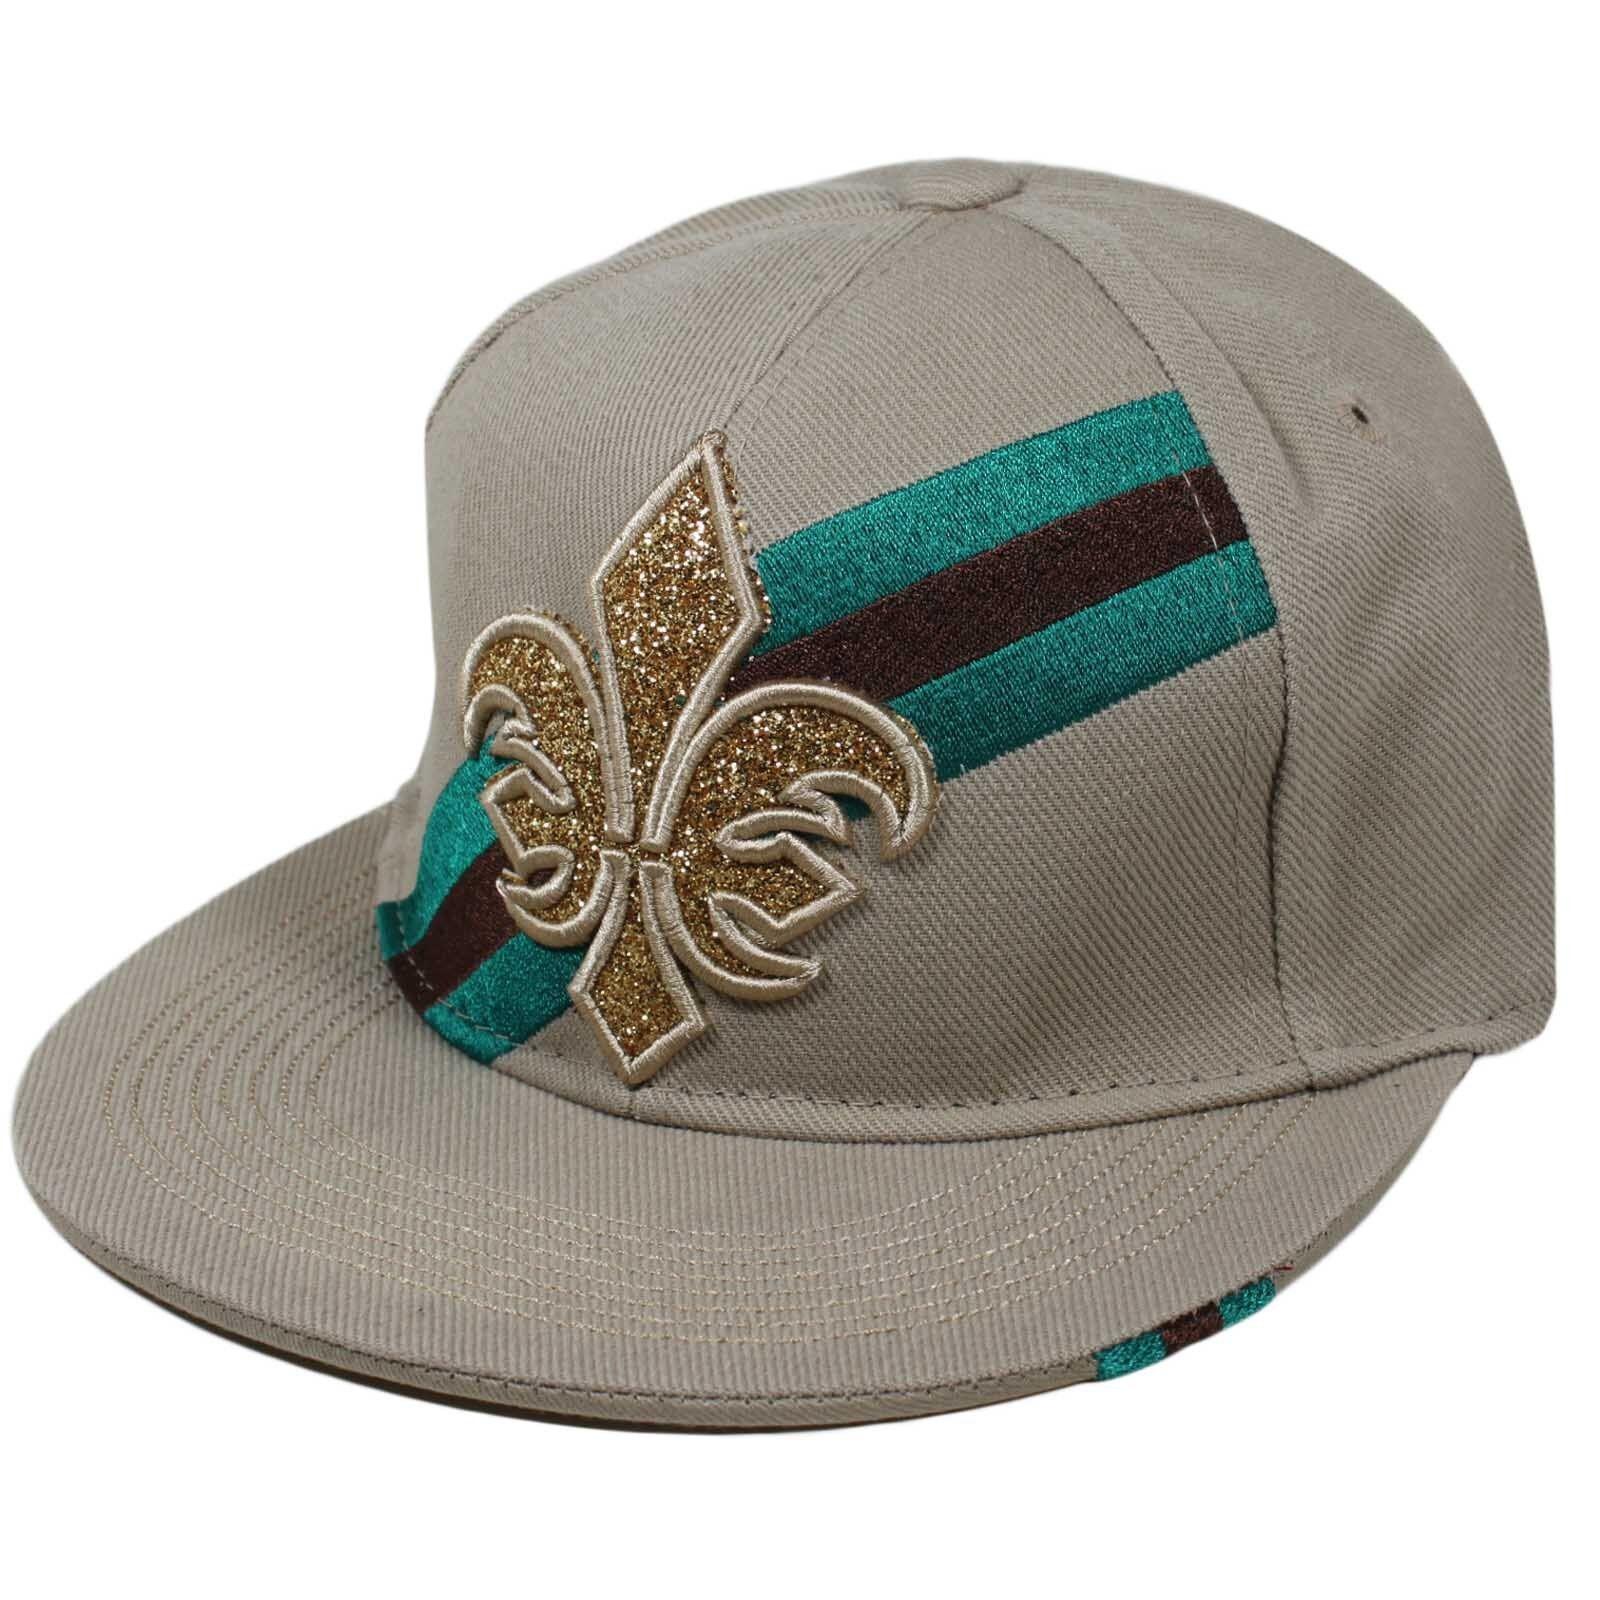 Hip Hop Hiphop Urban Wear Cap Hat Baseball Gangster Fitted Premium Headwear Ny